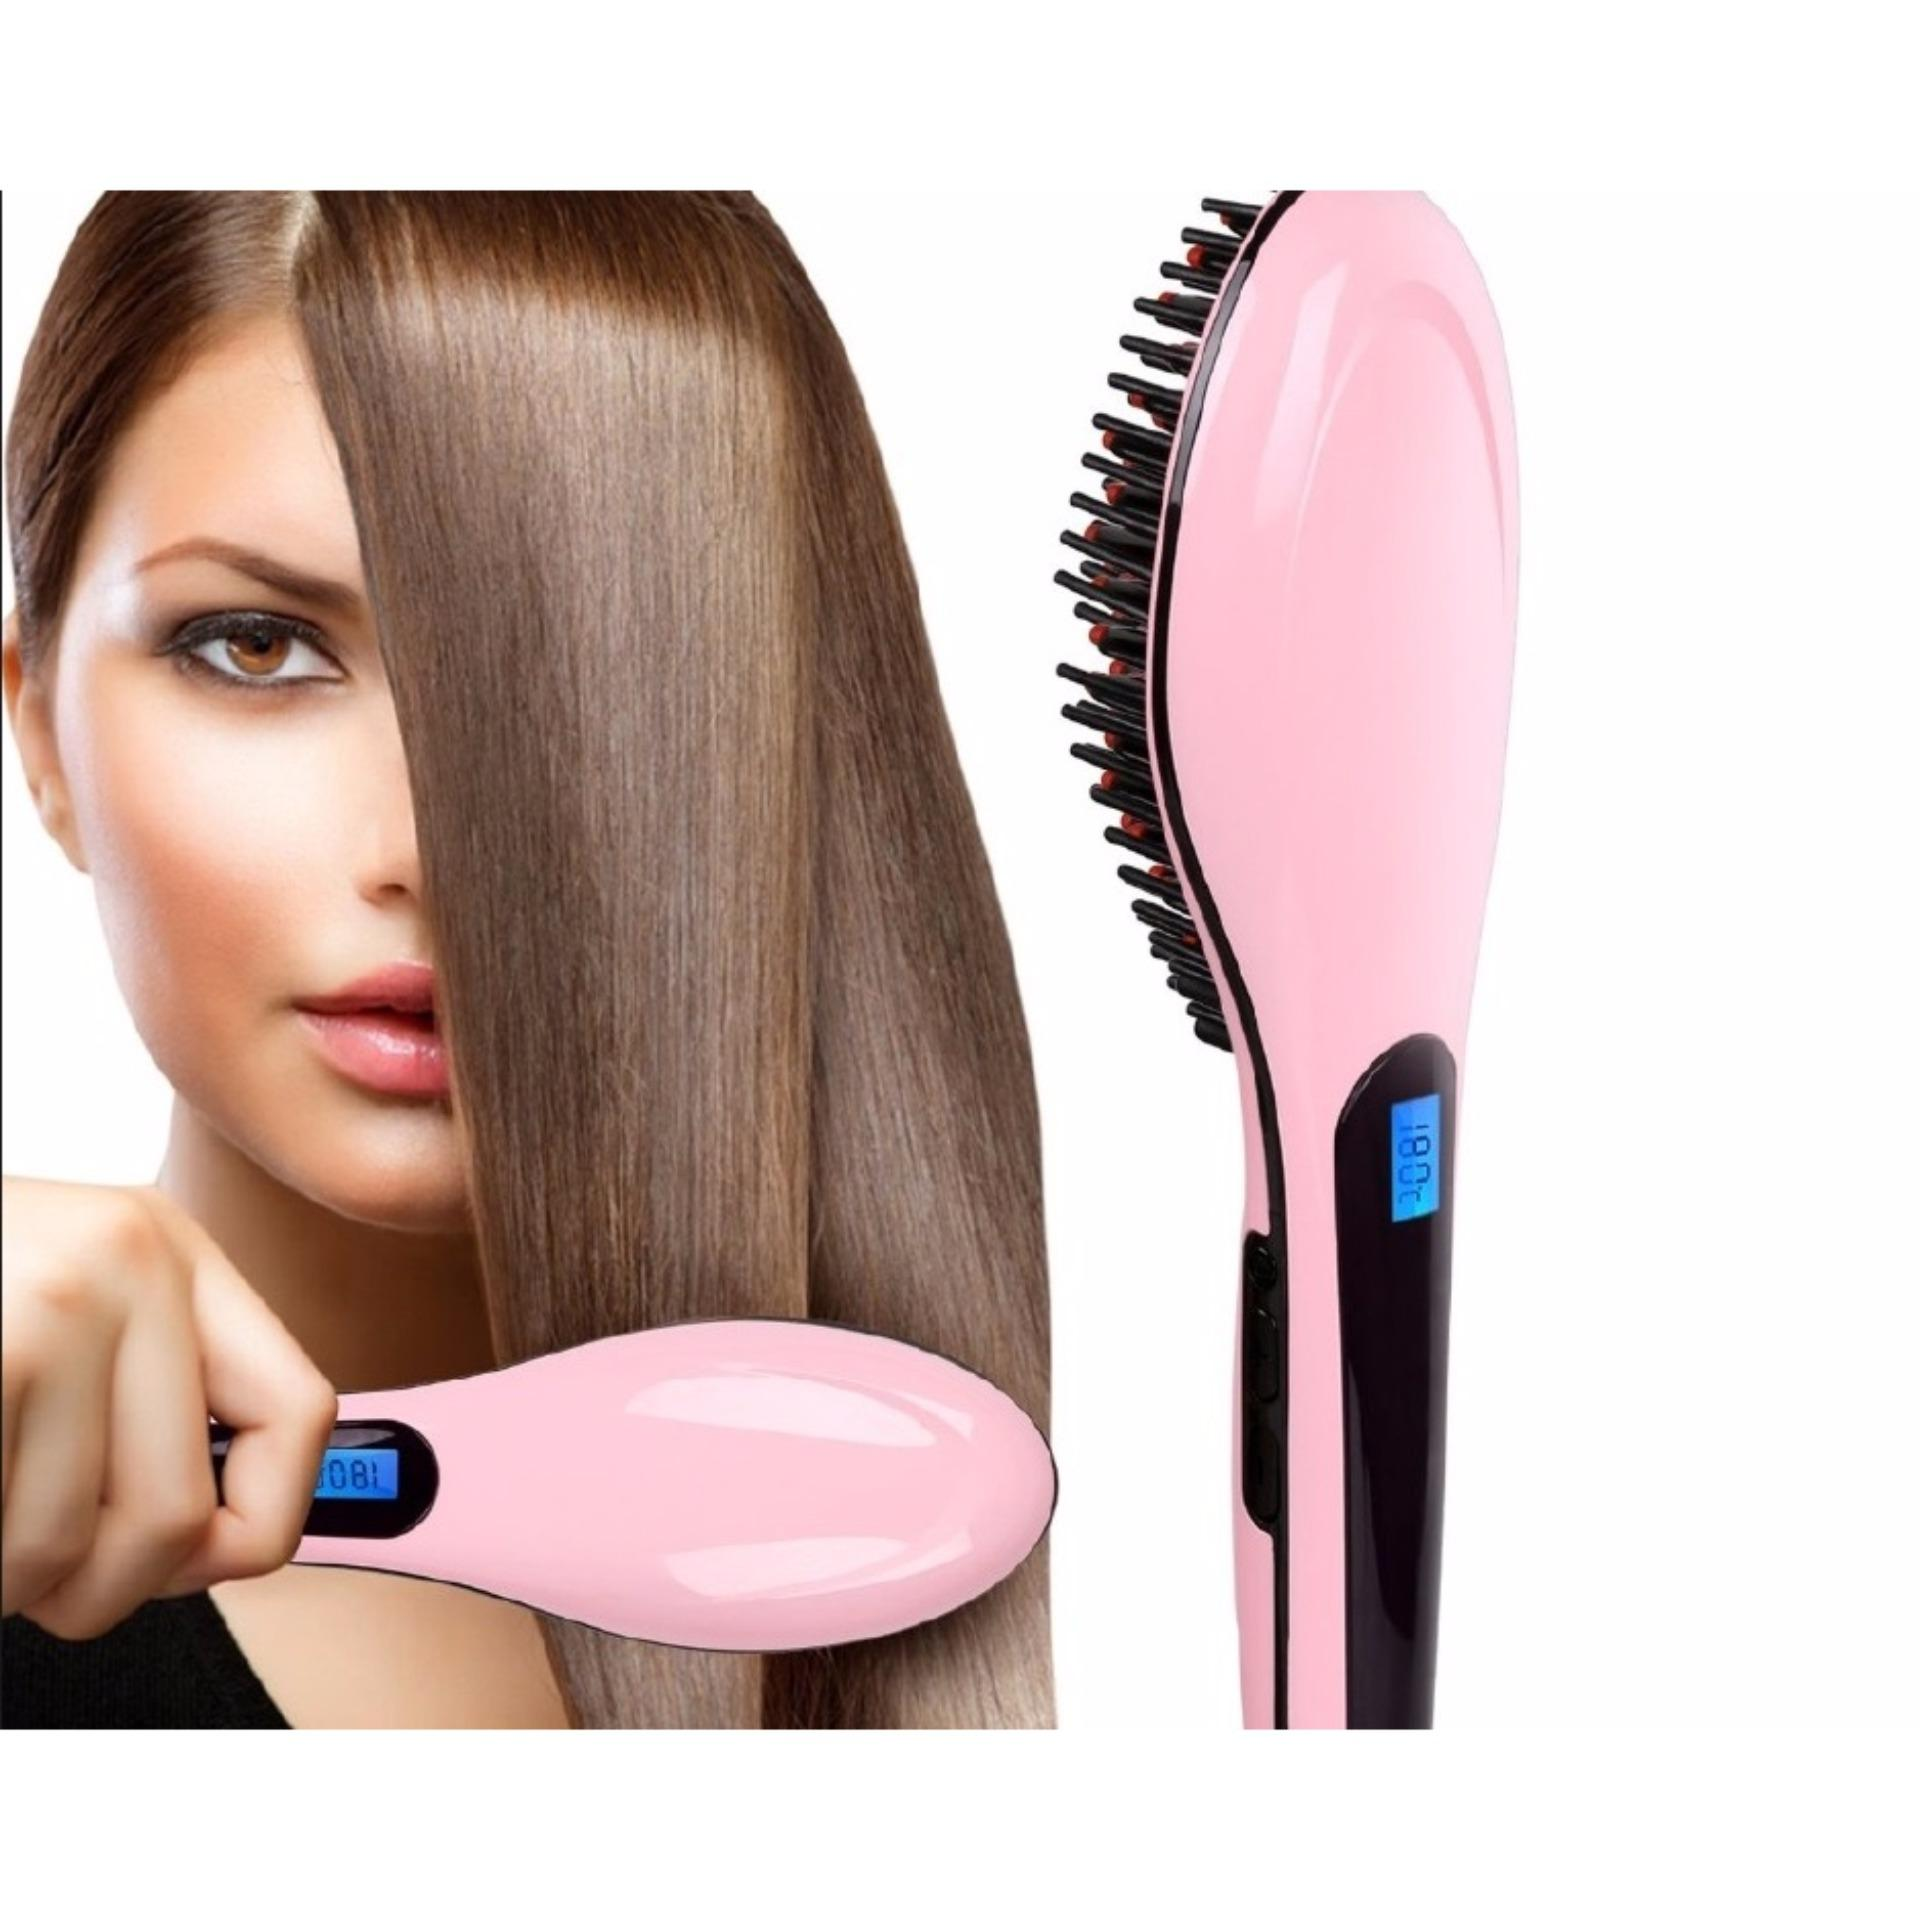 Sisir Catok Fast Hair Straightener Daftar Harga Terkini Dan Pianika Sj0038 Pelurus Rambut Elektronik Catokan Lurus Pink